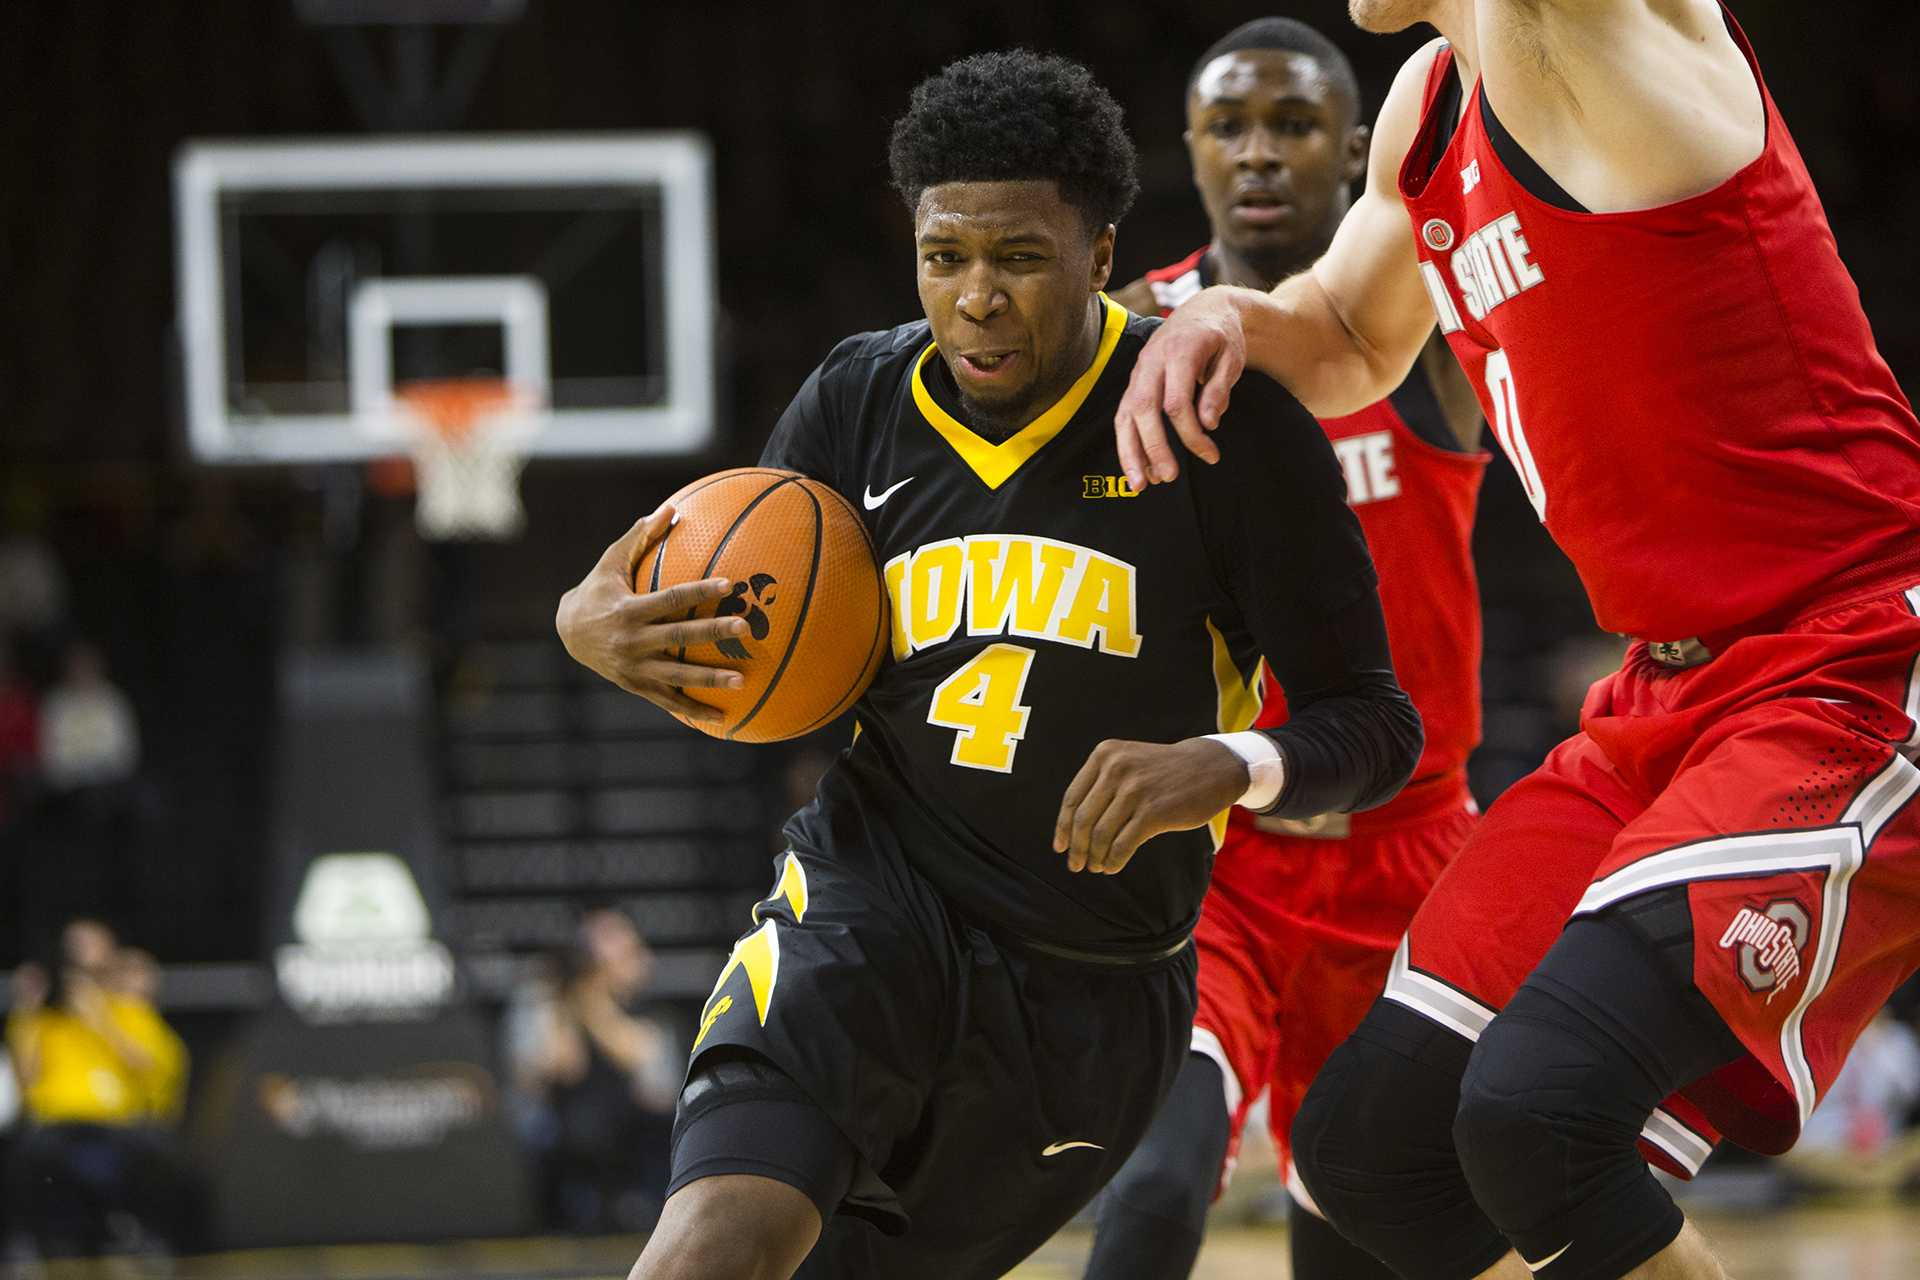 Isaiah Moss returns to Hawkeye basketball